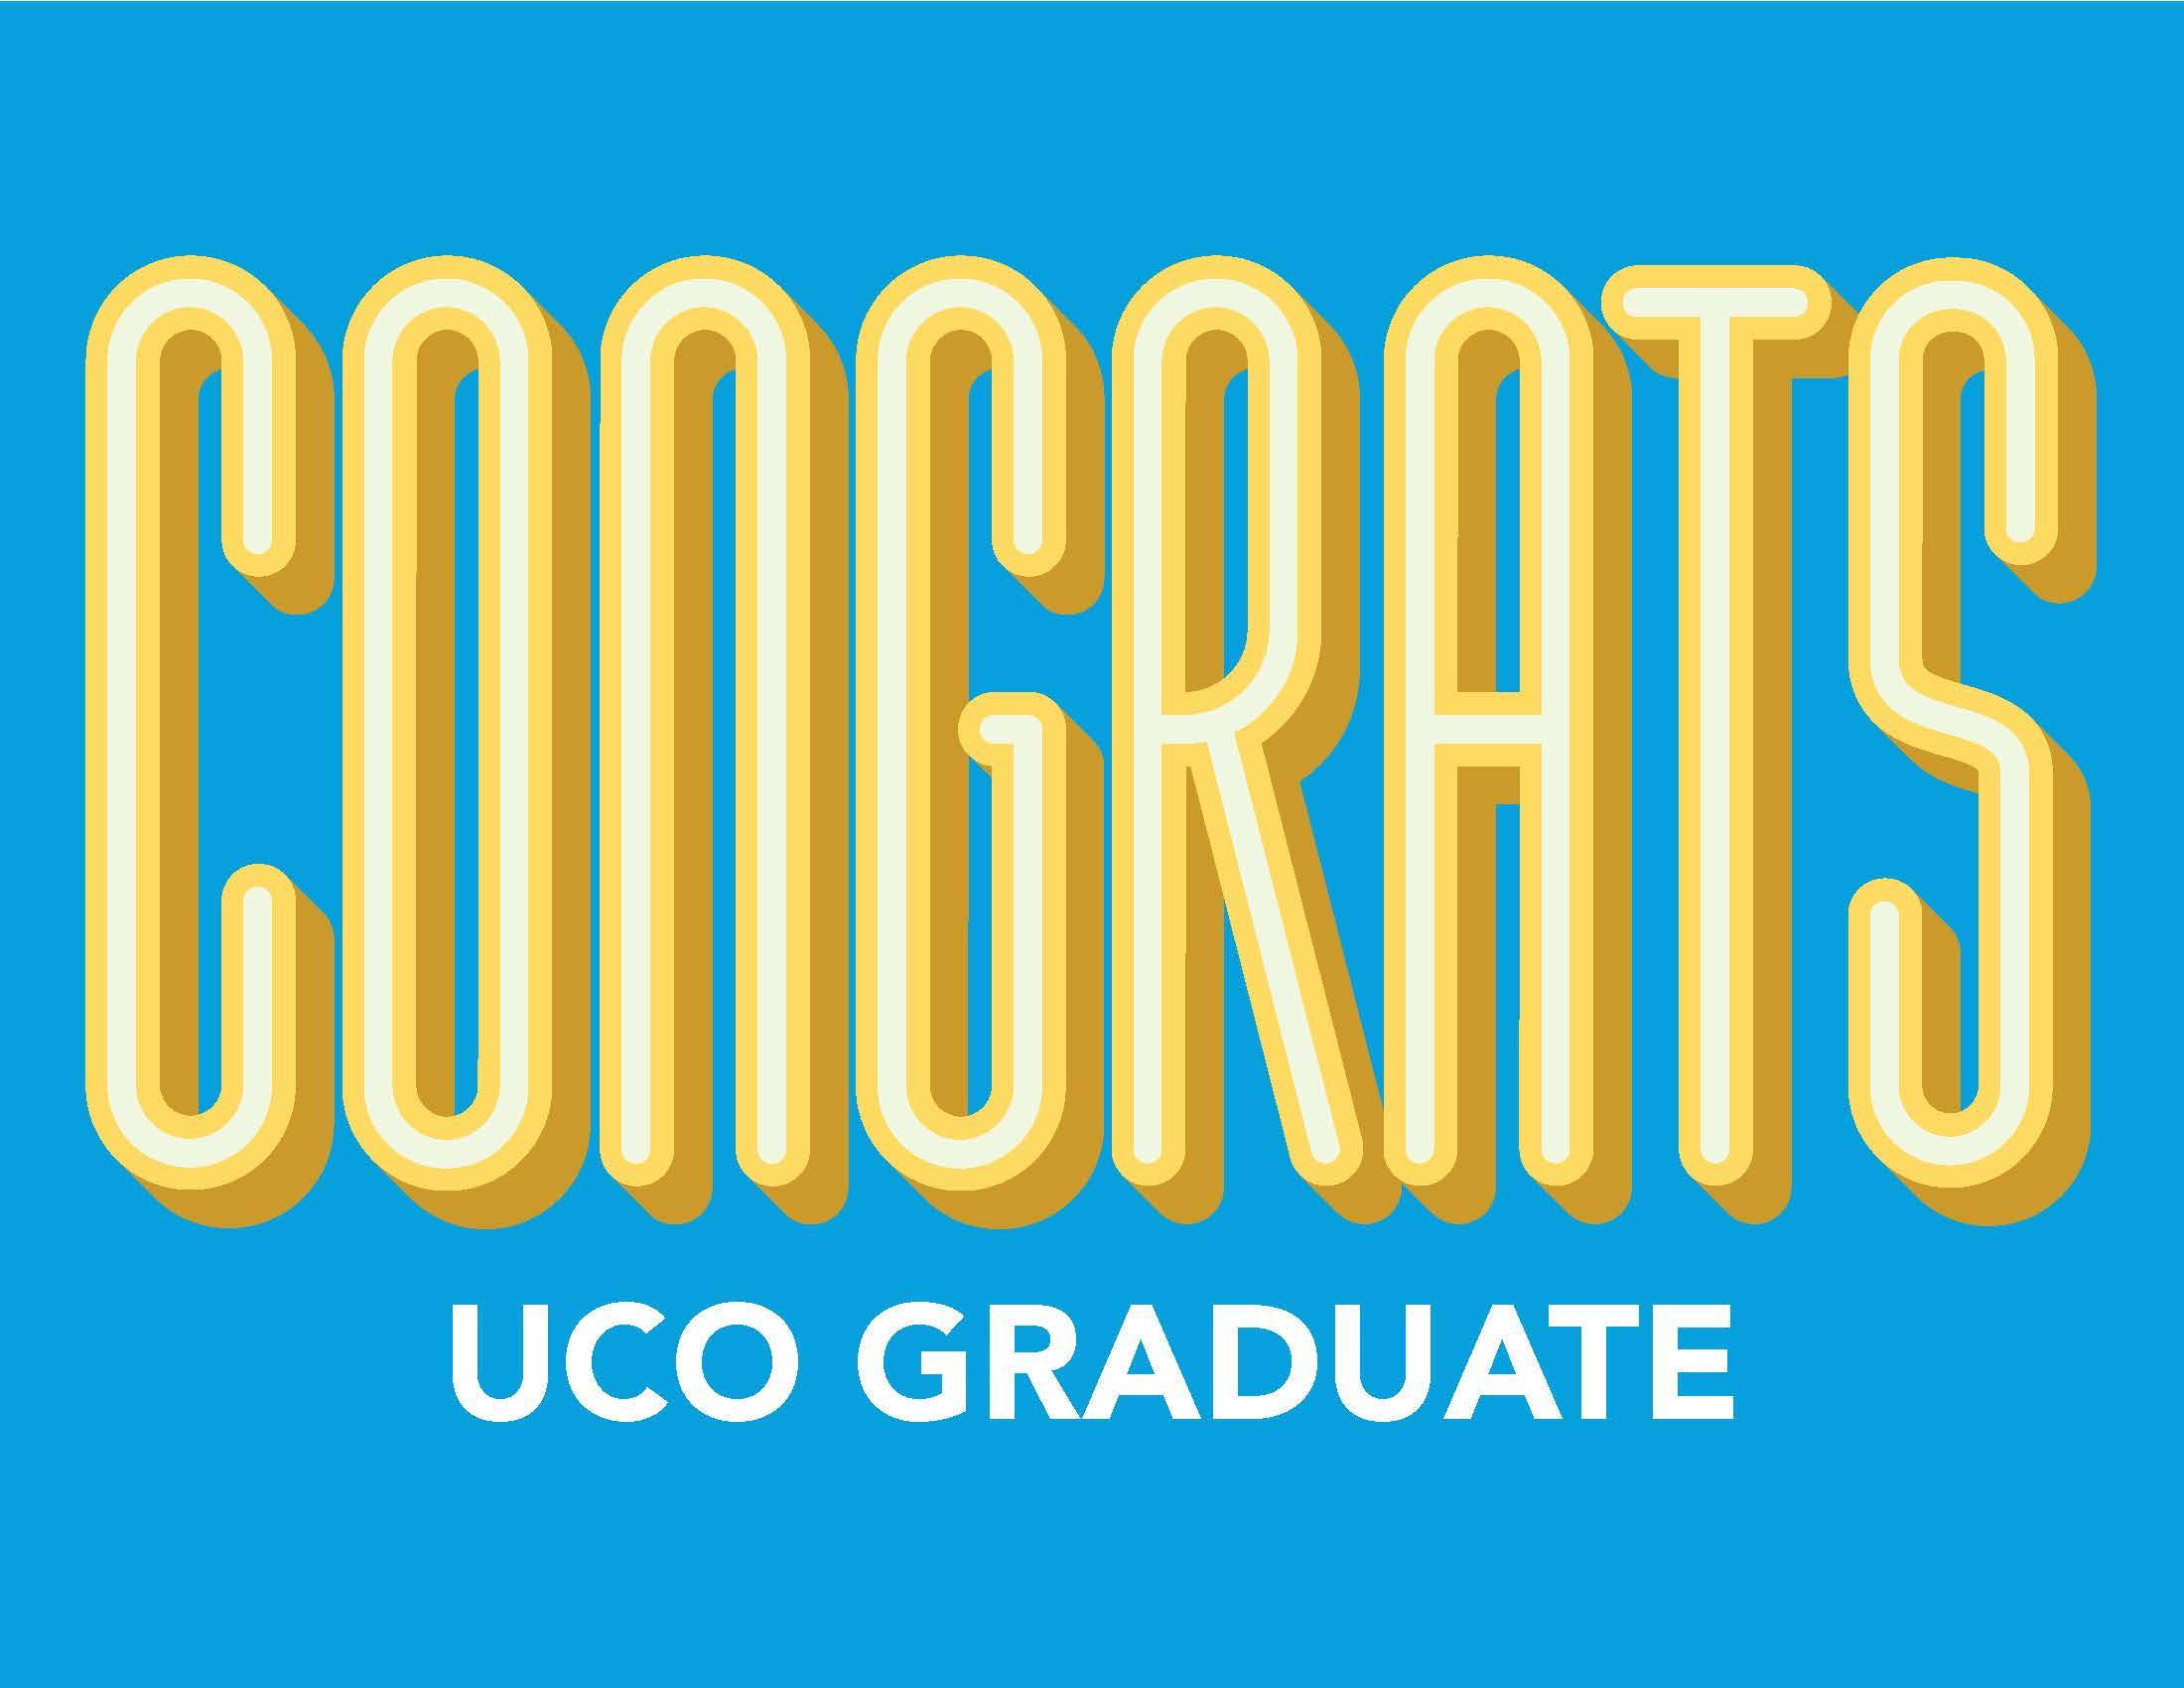 CONGRATS UCO Graduate graphic sign